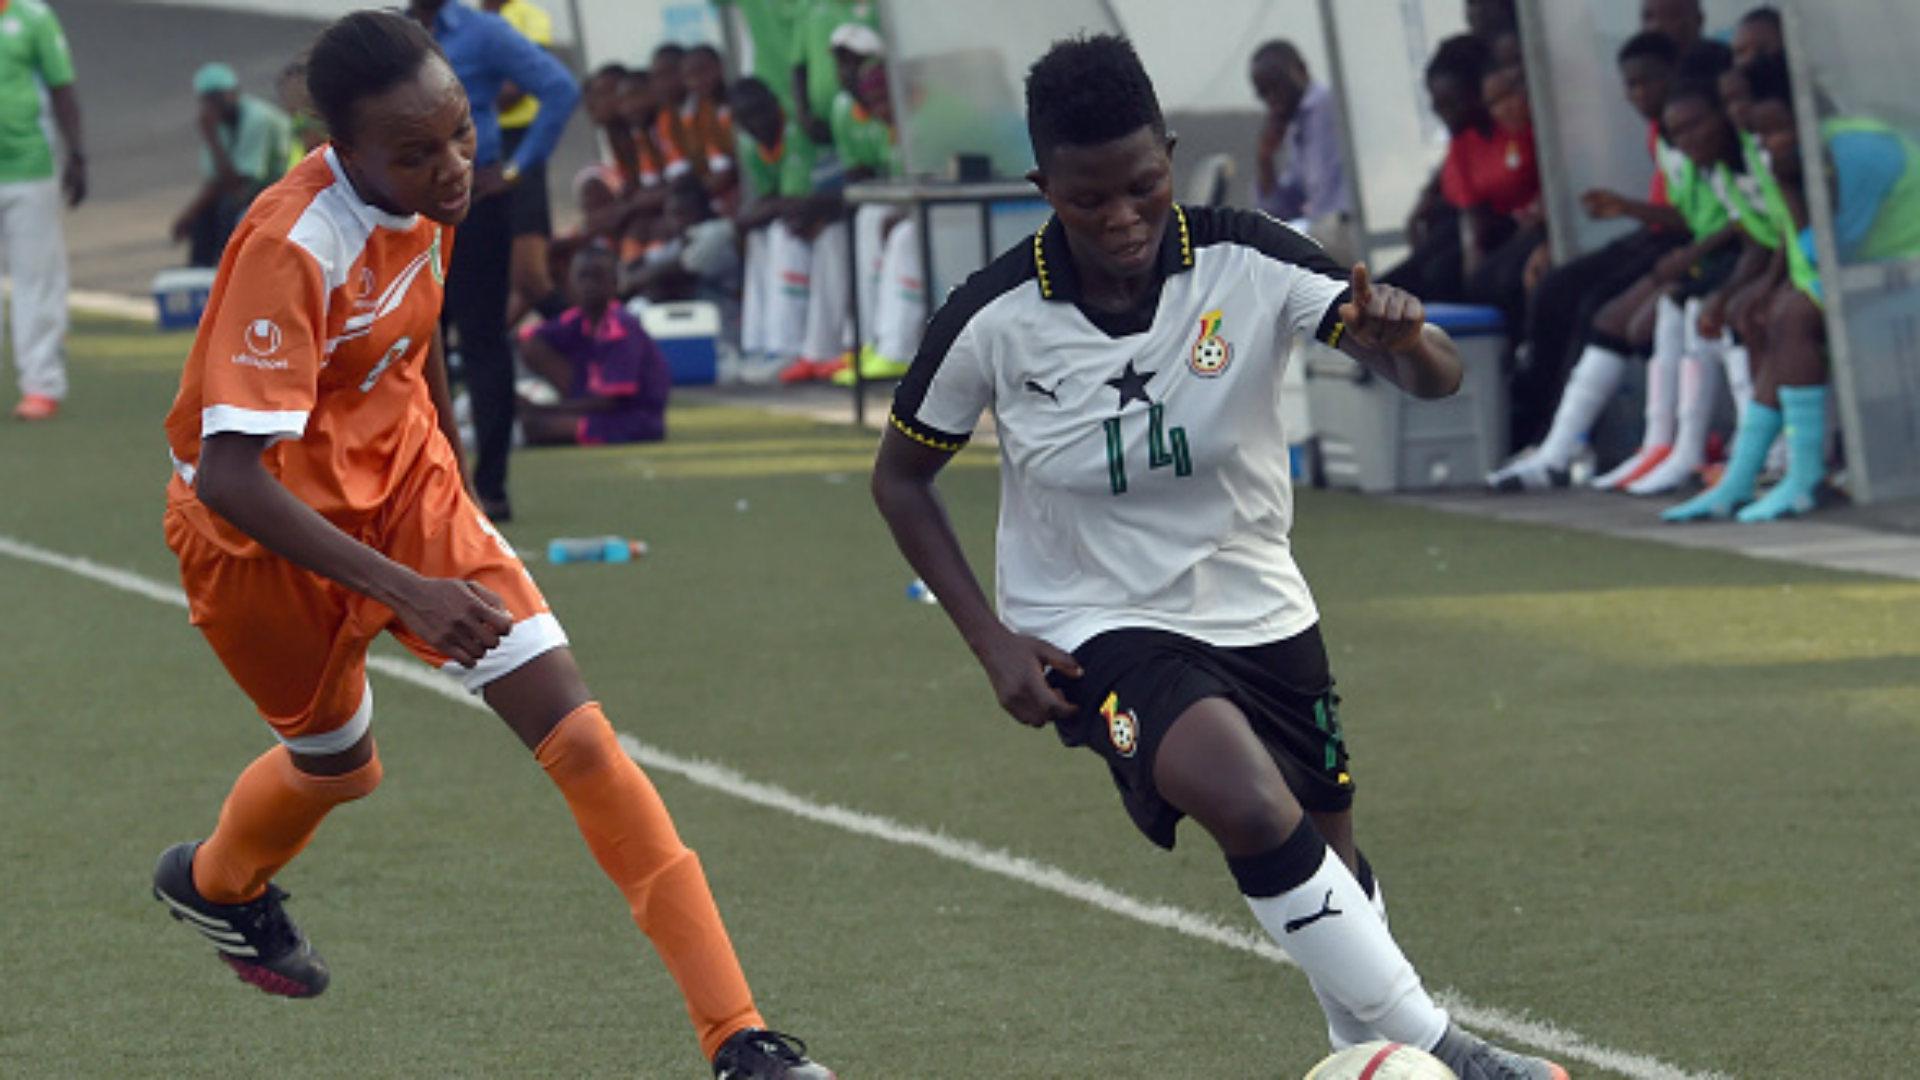 Black Queens captain Priscilla Okyere fired up for Morocco friendlies